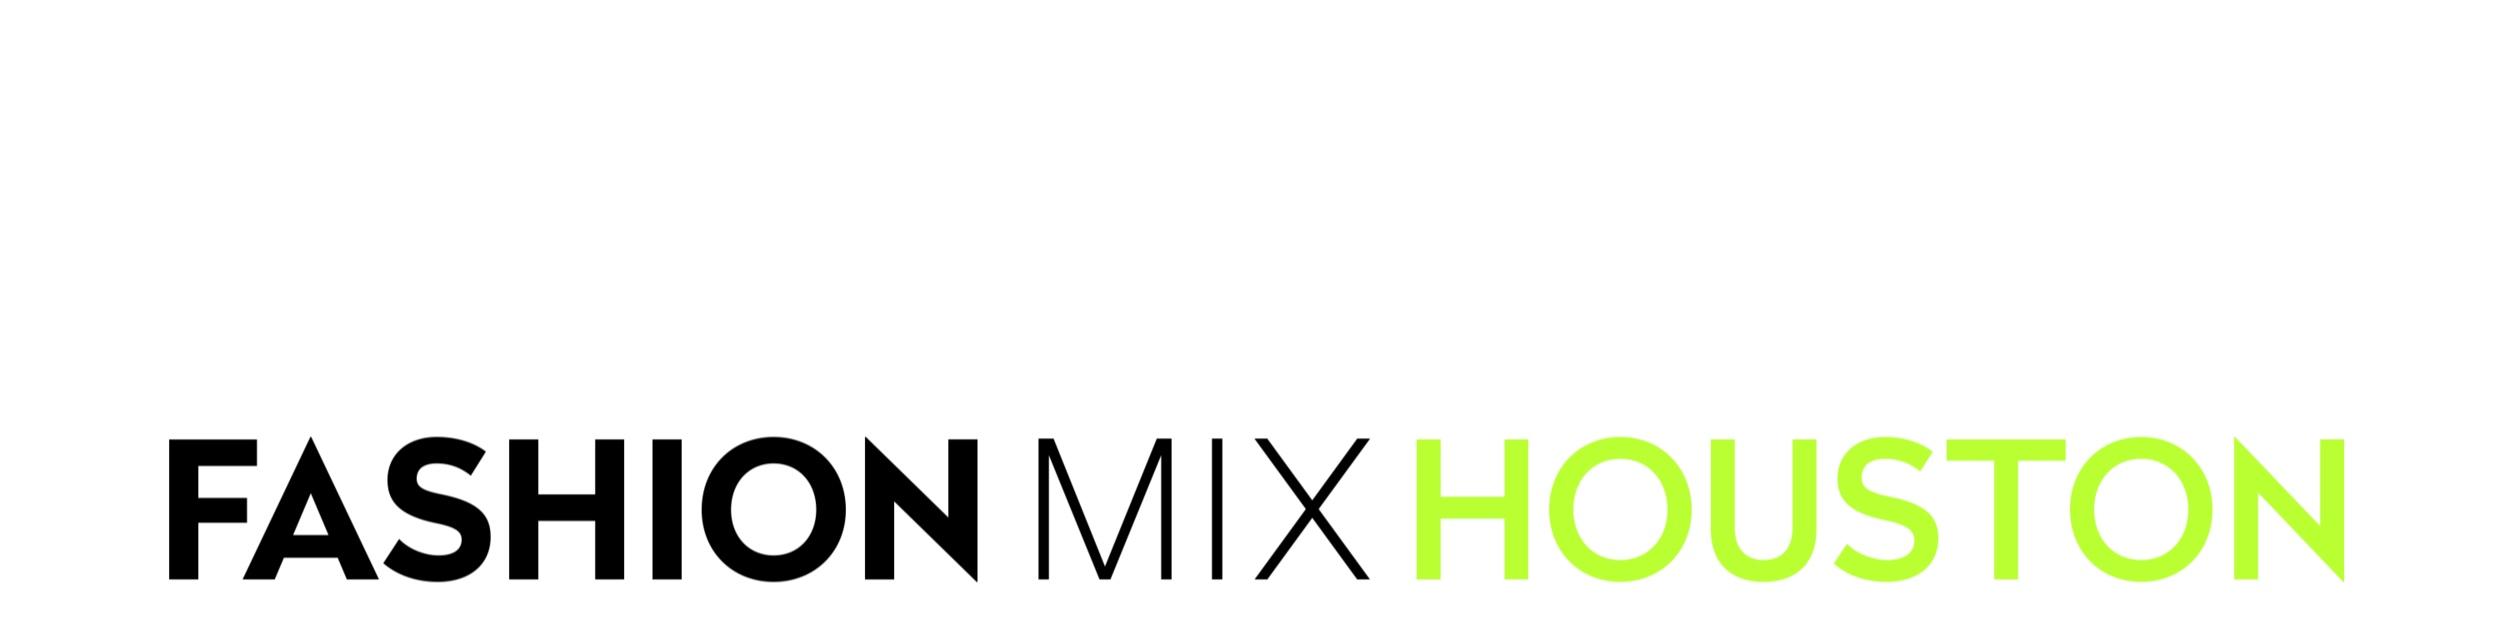 FMH+Logo.jpg